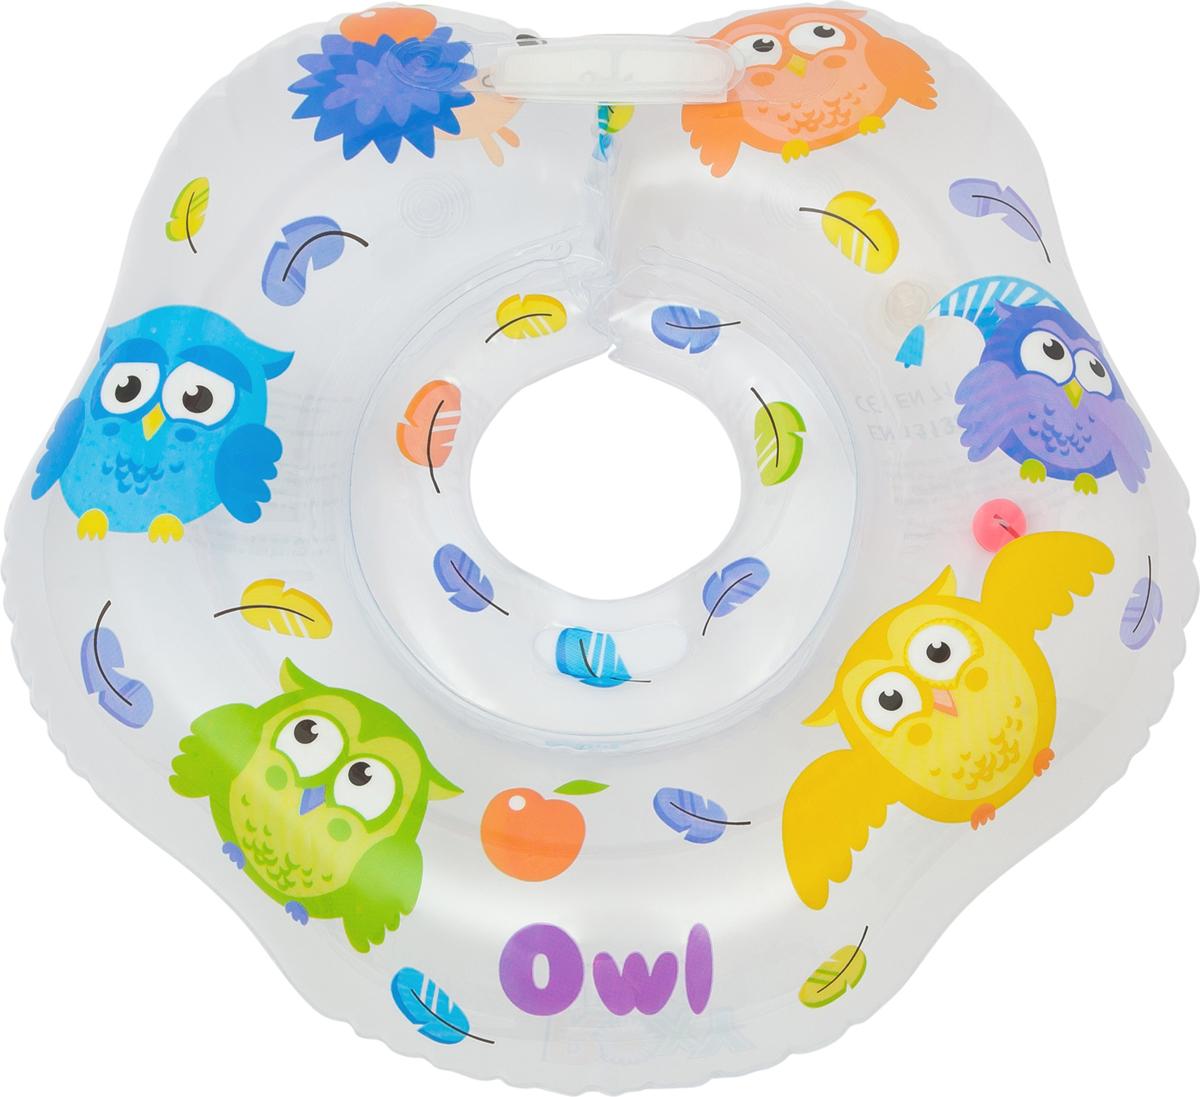 Roxy-kids Круг для купания Owl roxi kids fl002 круг на шею для купания малышей